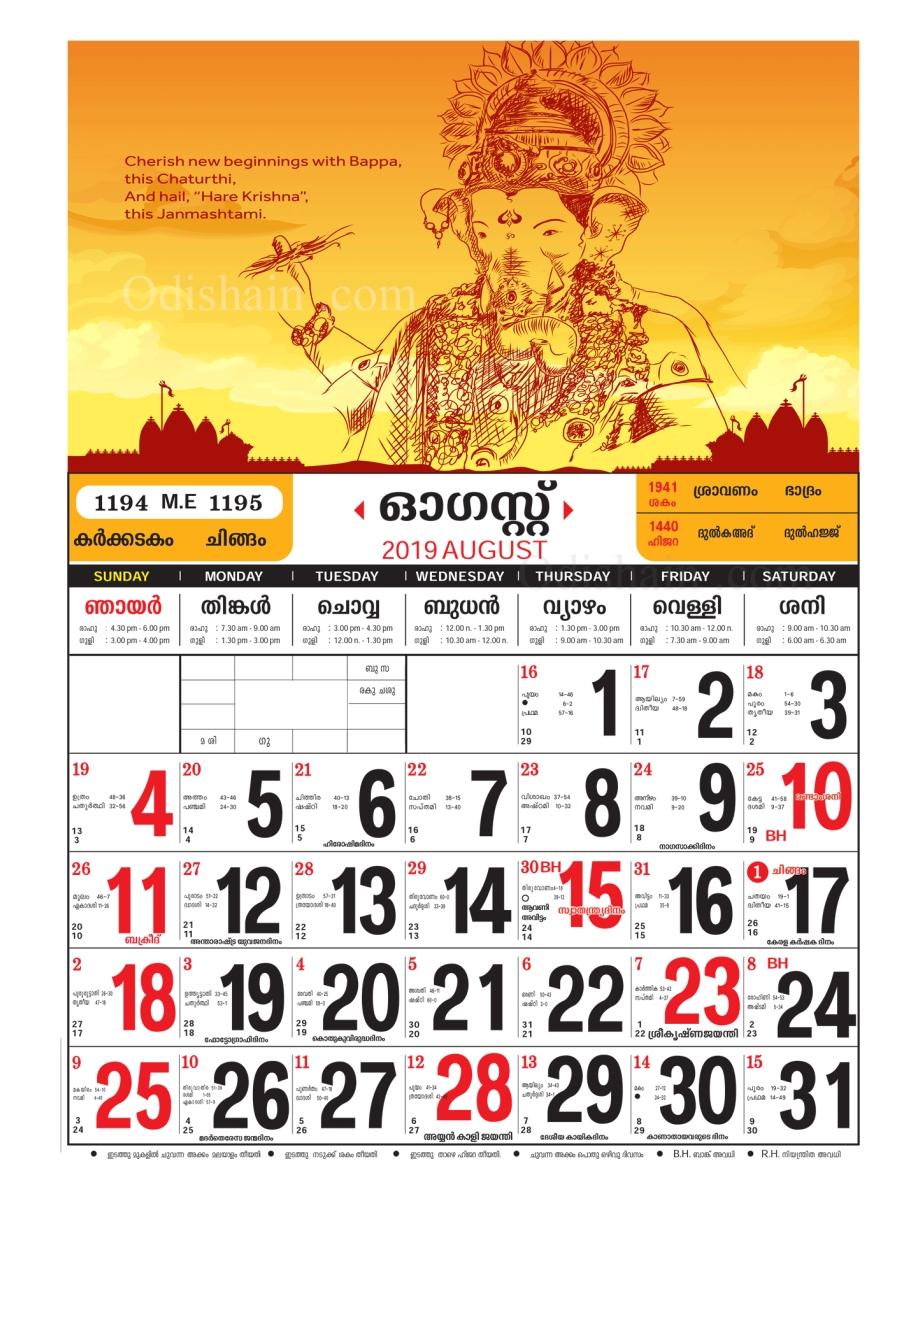 Malayala Manorama Calendar 2020 March - August 2019